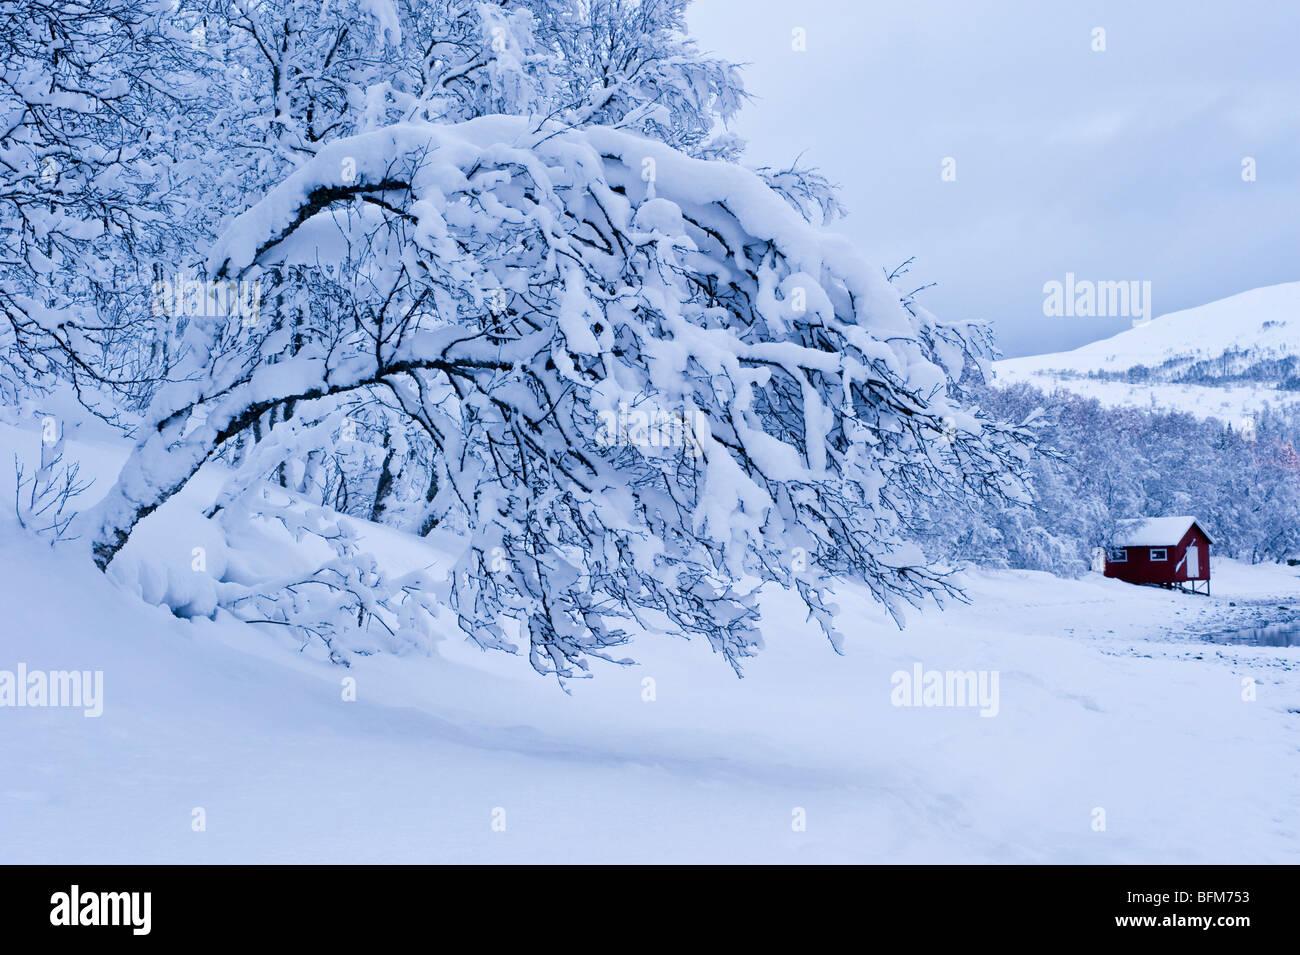 Heavy burden of snow on a tree - Stock Image